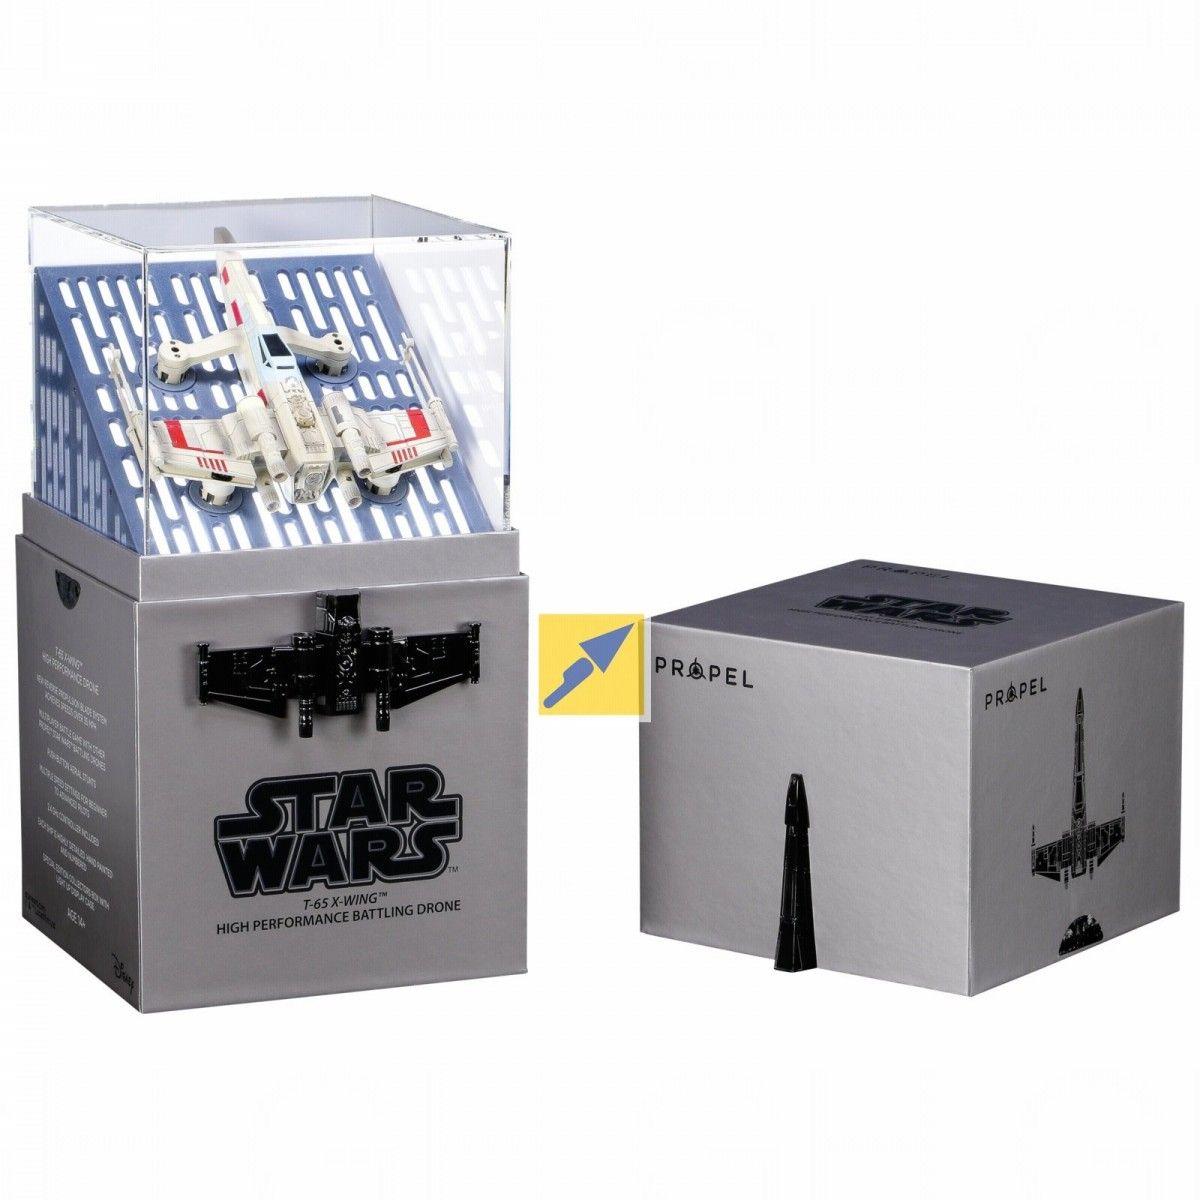 RC-Spielzeug PROPEL Star Wars X-Wing Battle Drone Sammler Edition